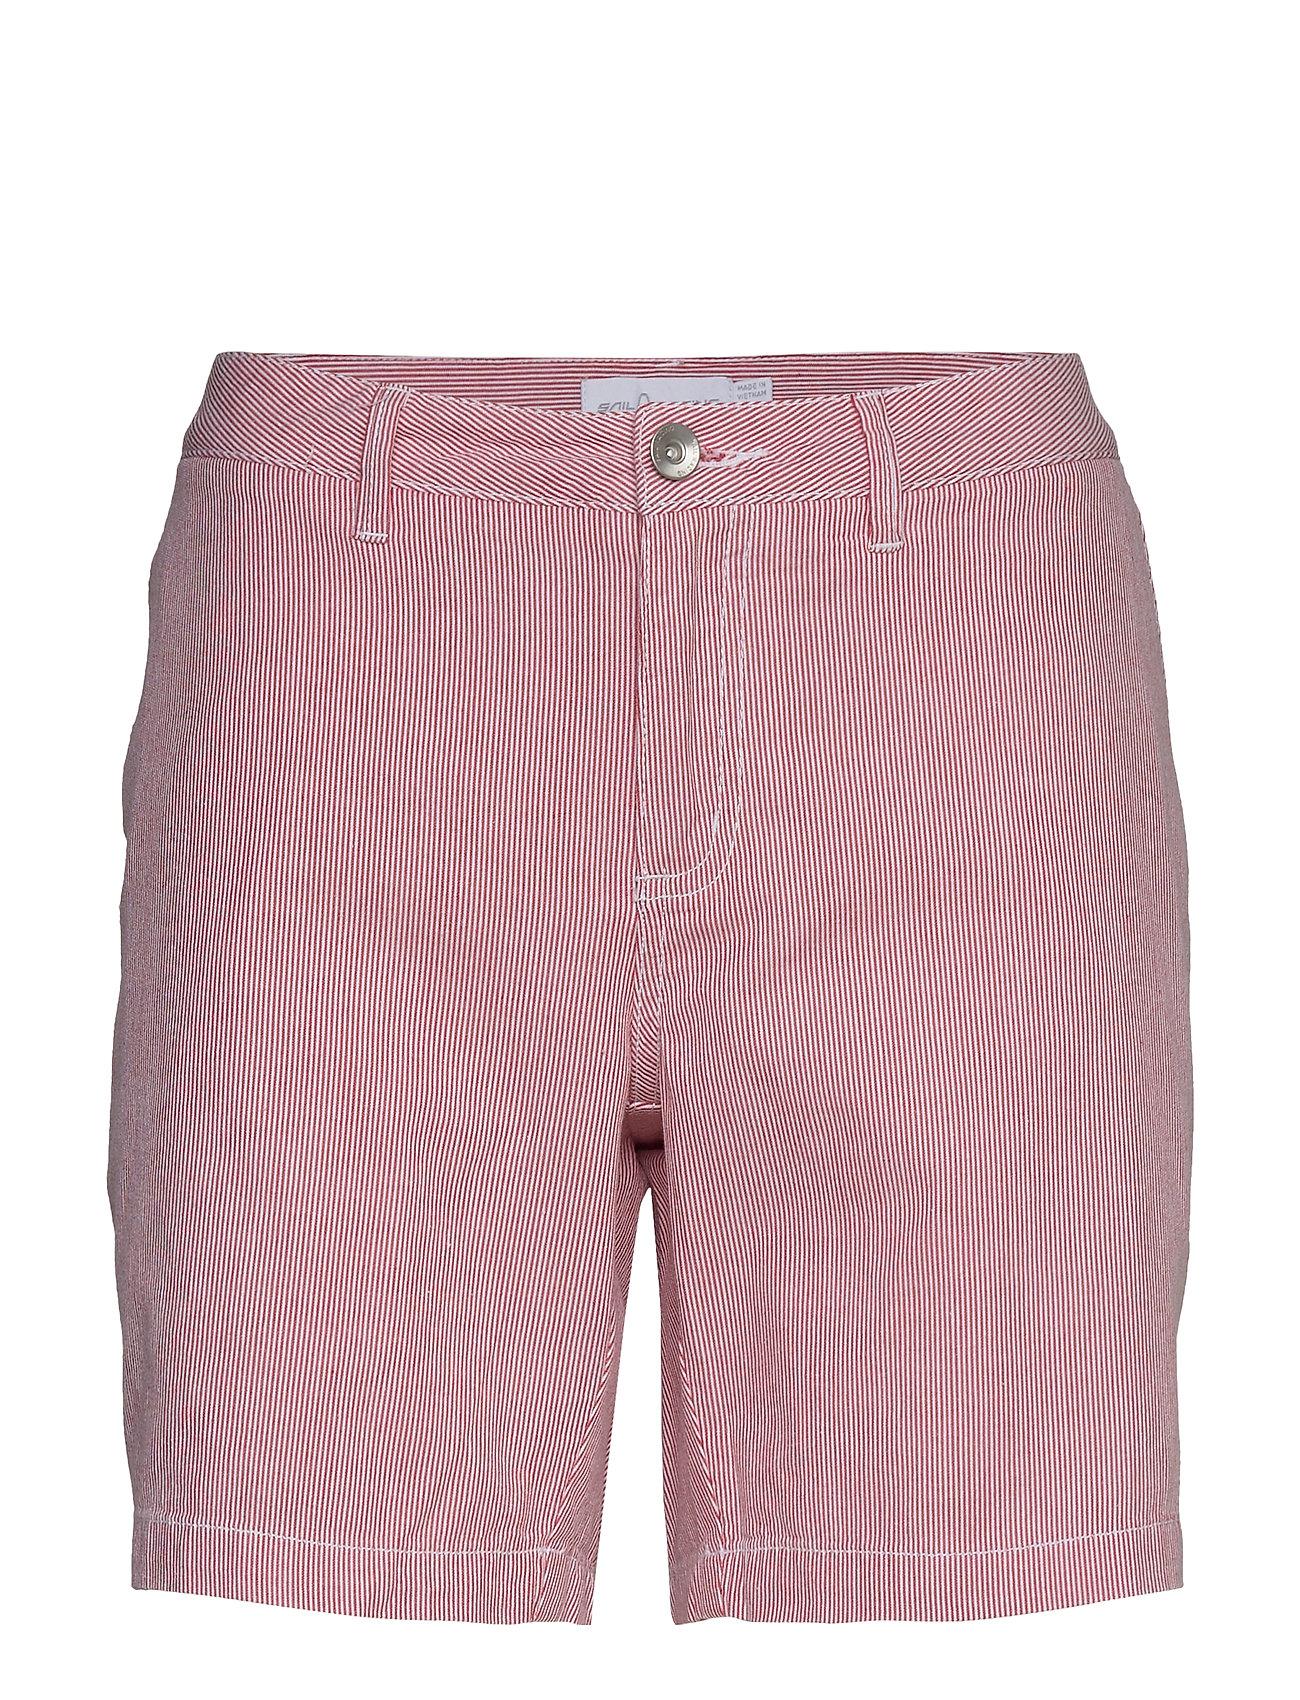 Image of W Gale Striped Chino Shorts Shorts Chino Shorts Lyserød Sail Racing (3427061121)